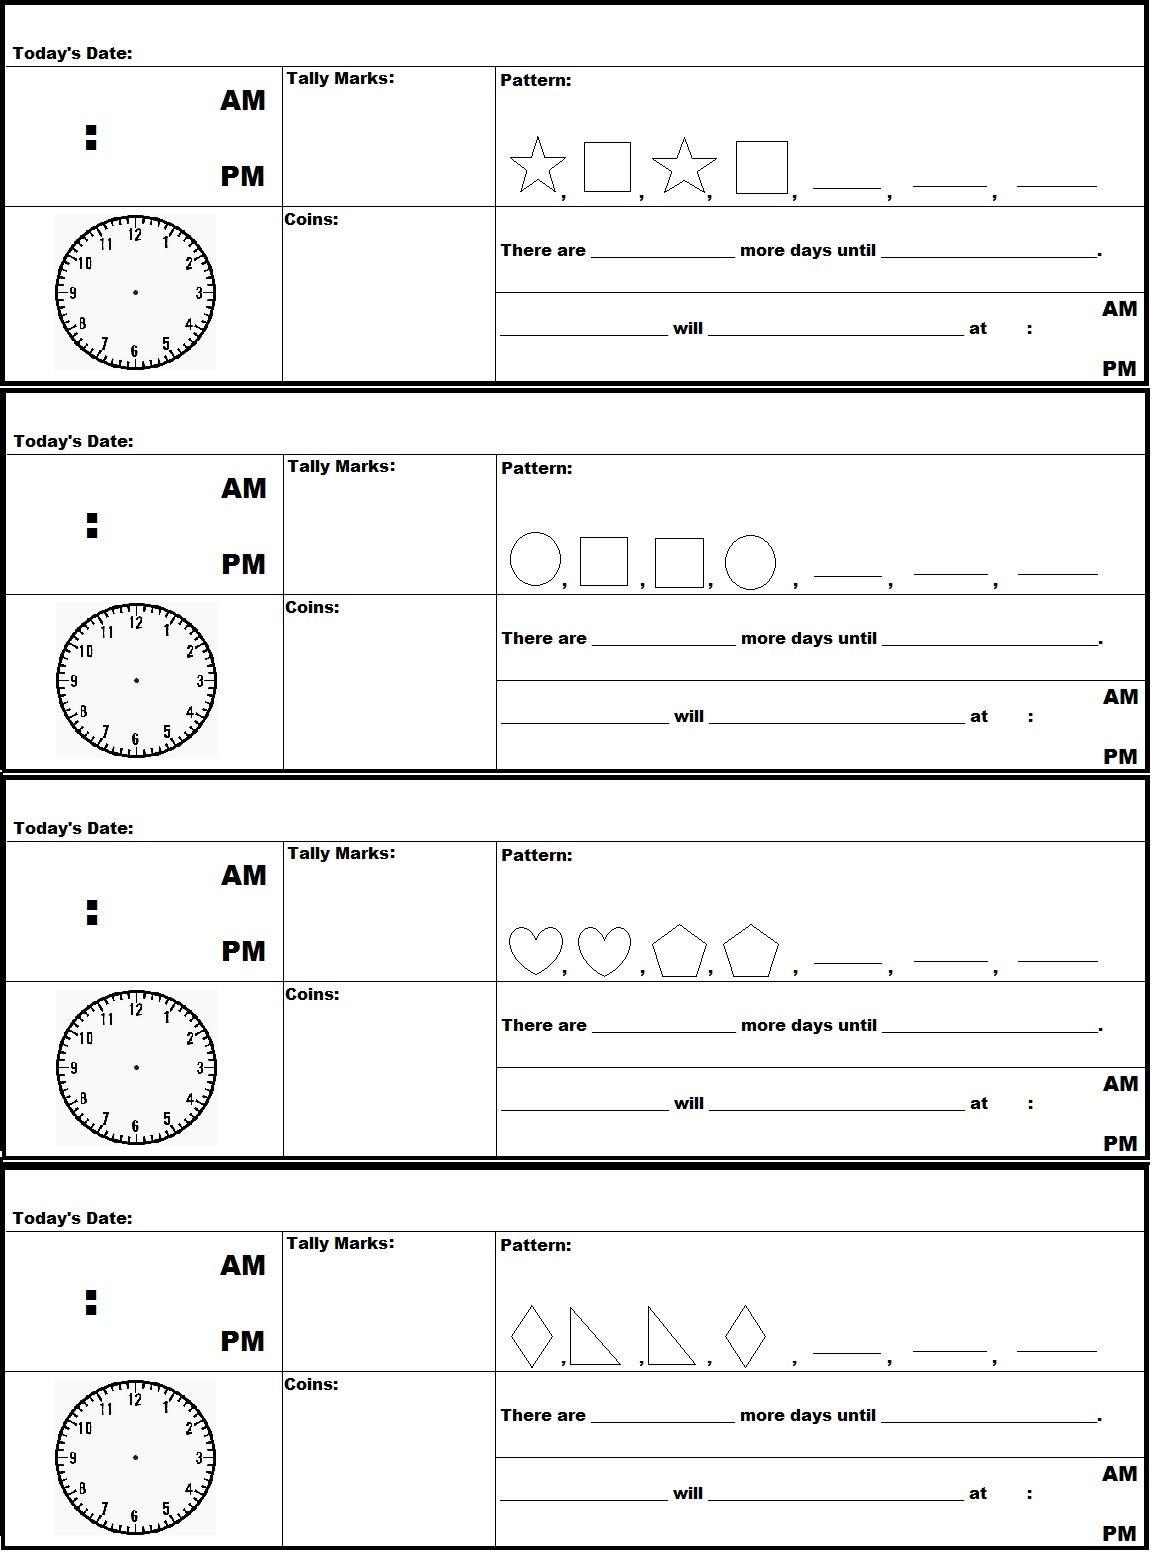 Saxon Math 6th Grade Worksheets A Free Printable Document Of Saxon Math 2nd Grade Meeting